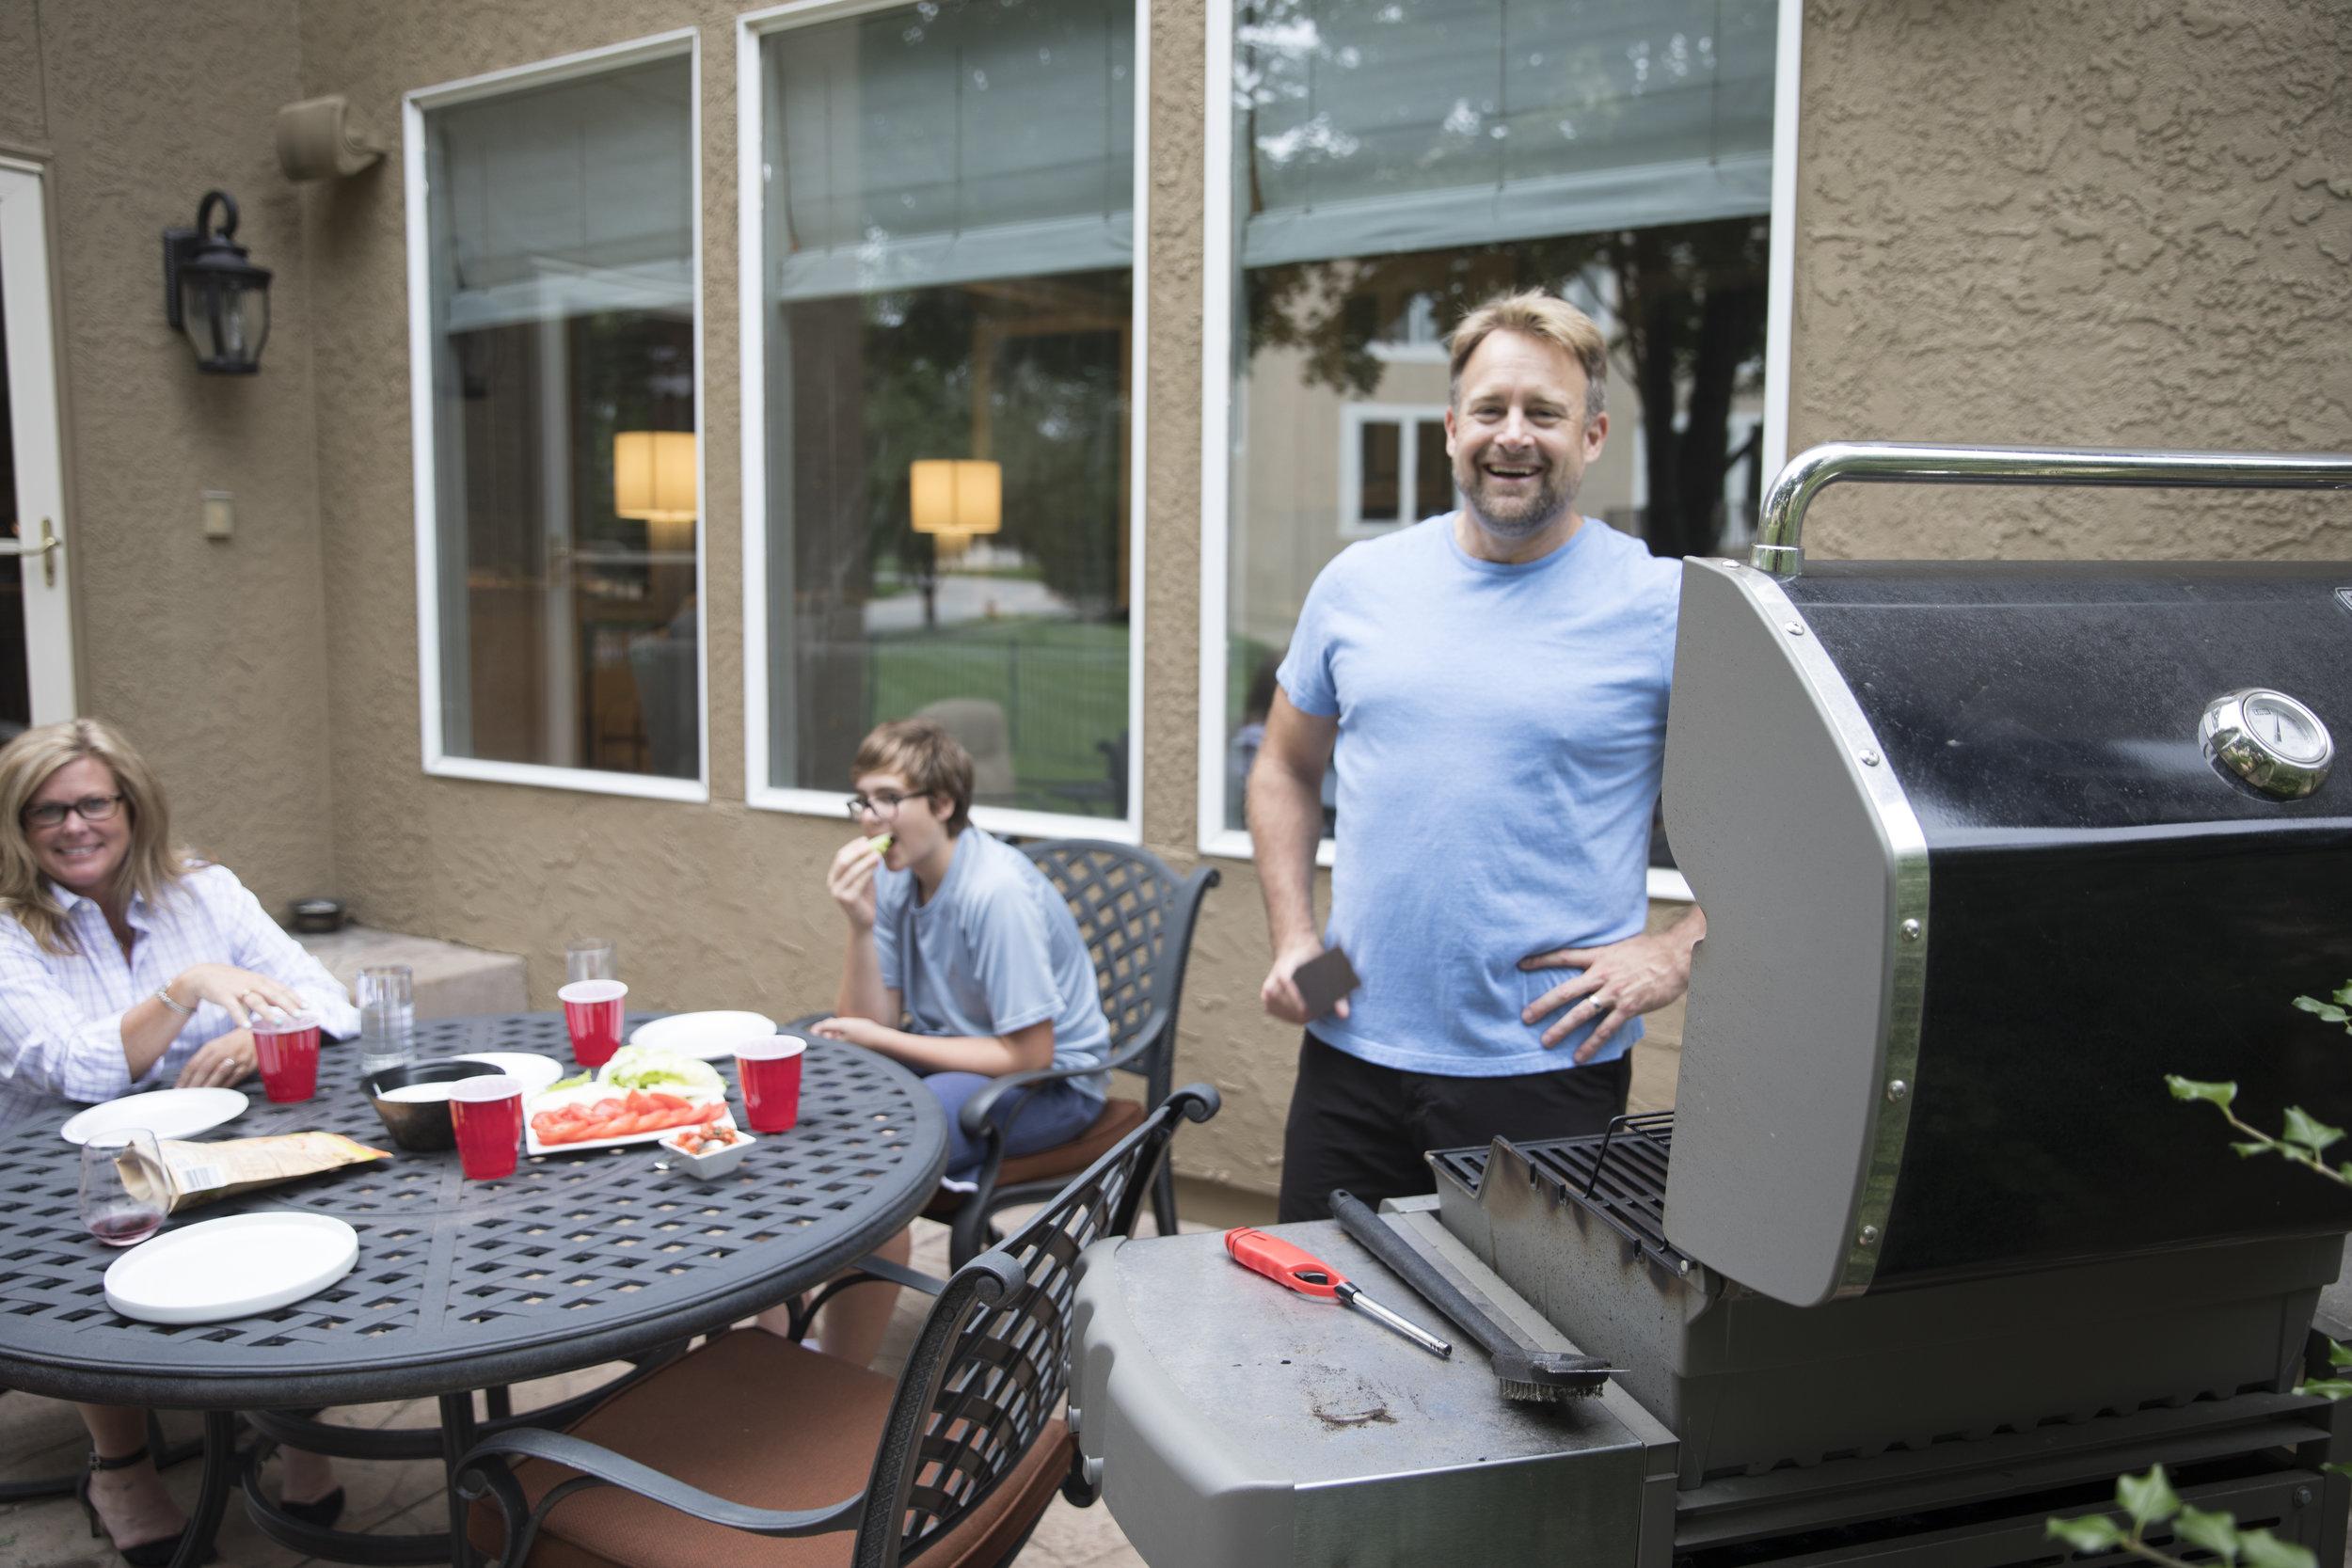 Trevor grilling for the family